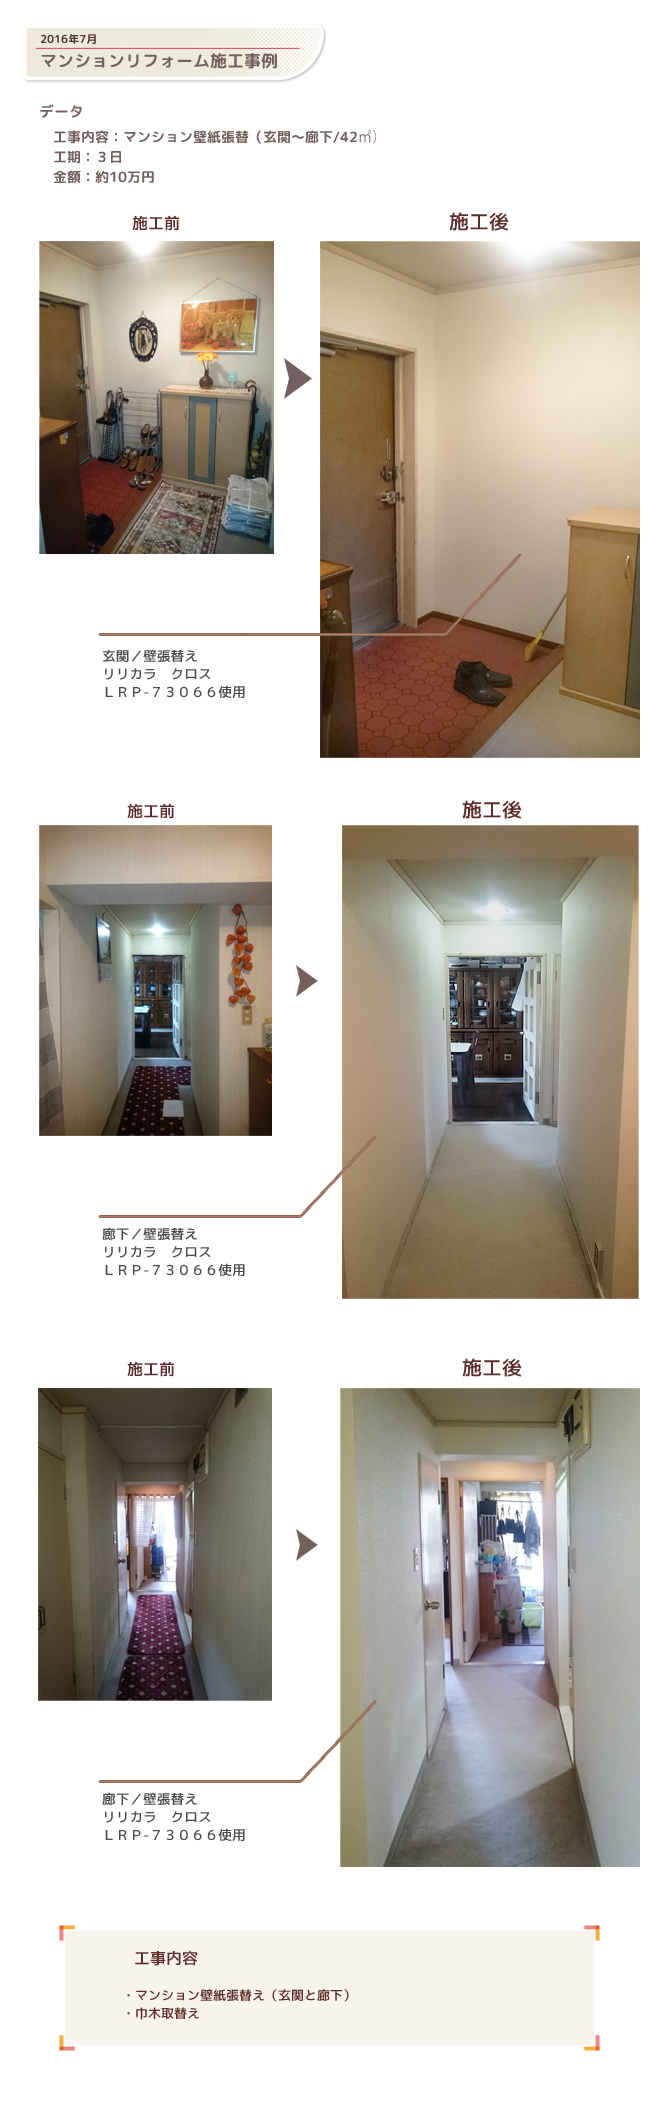 wall001.jpg